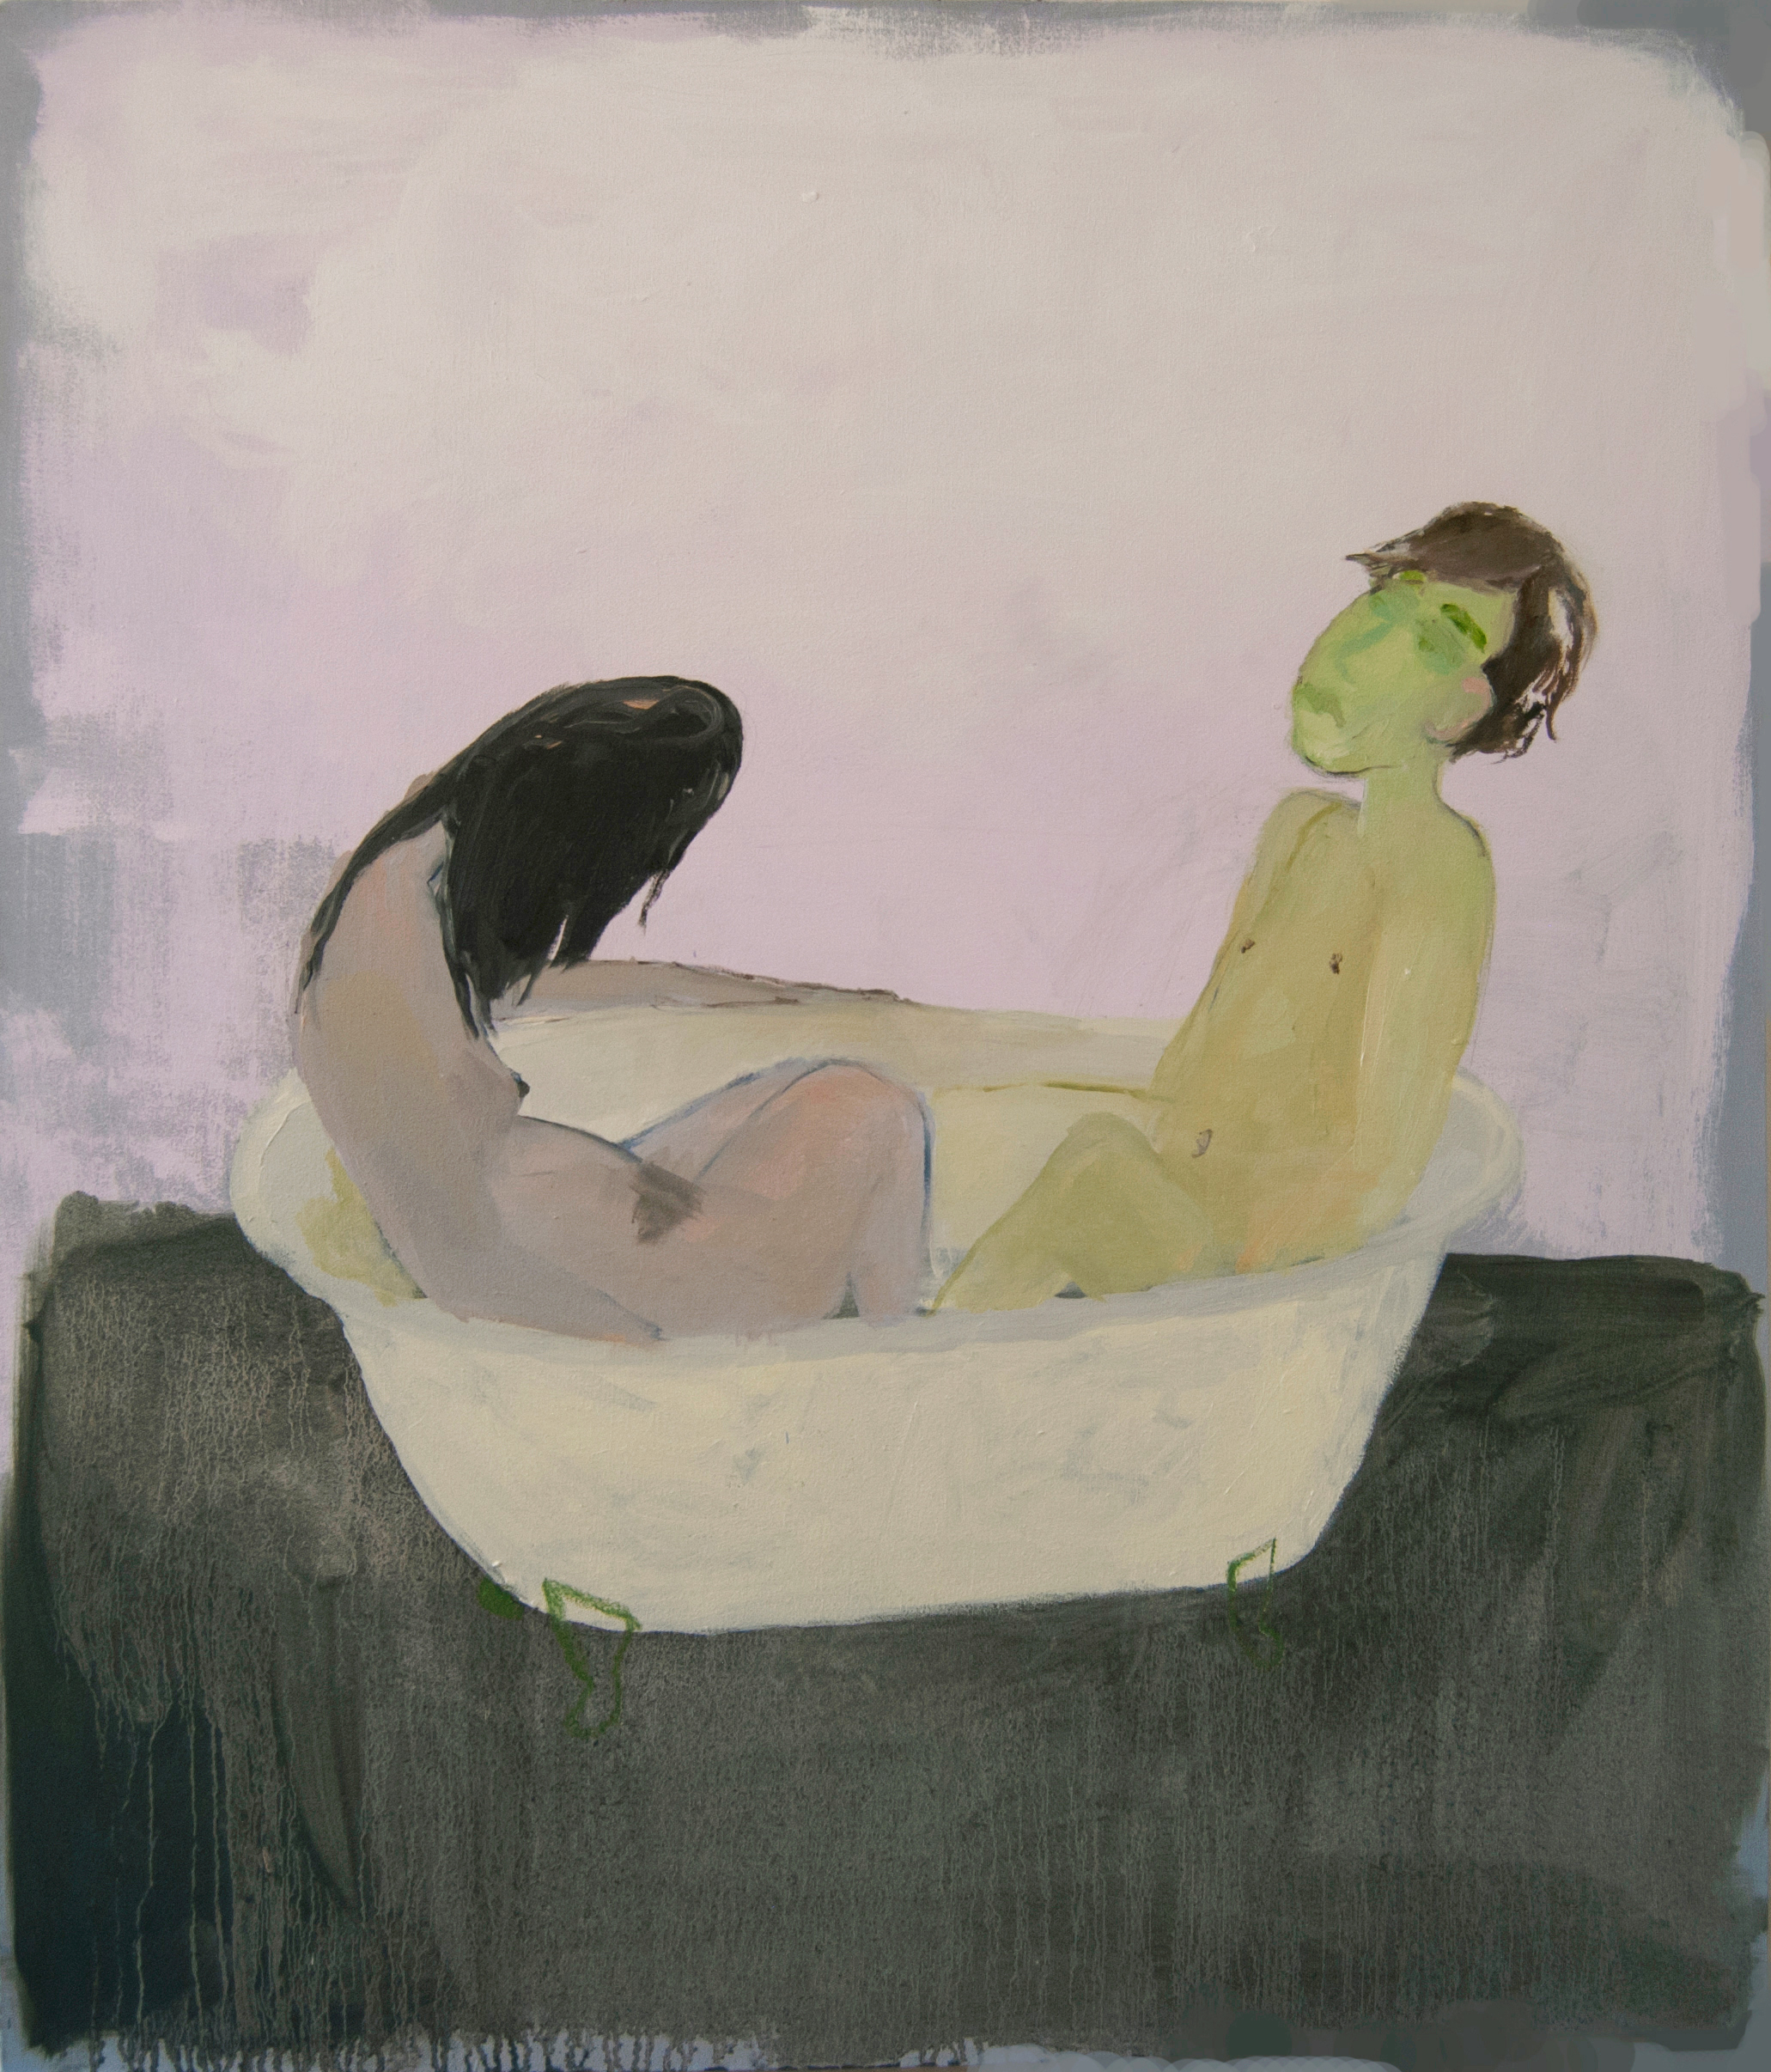 Pillowtalk (The Bathers)